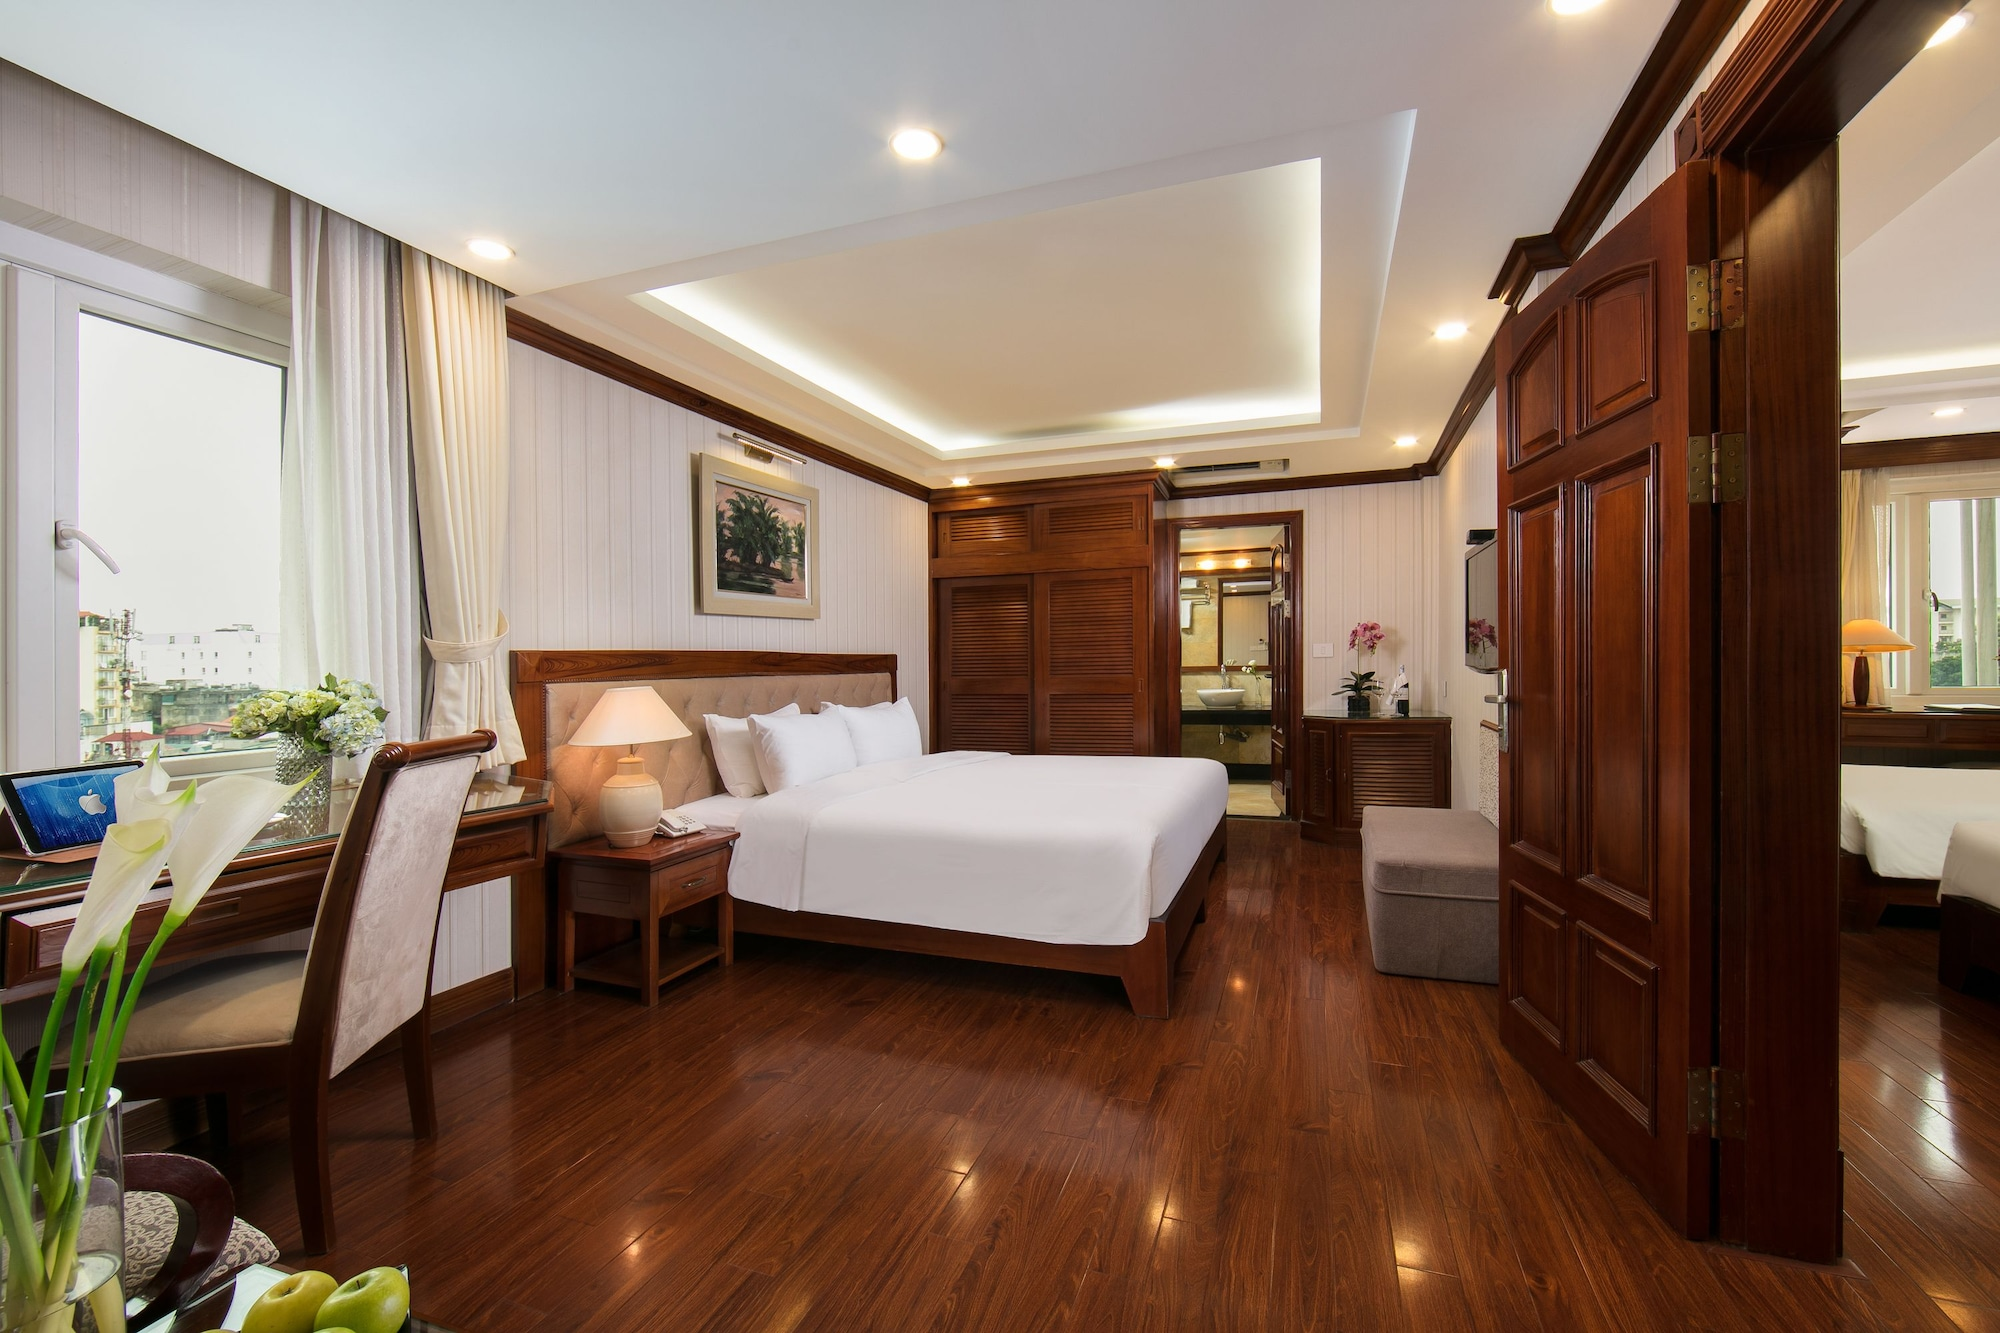 Babylon Grand Hotel & Spa, Ba Đình